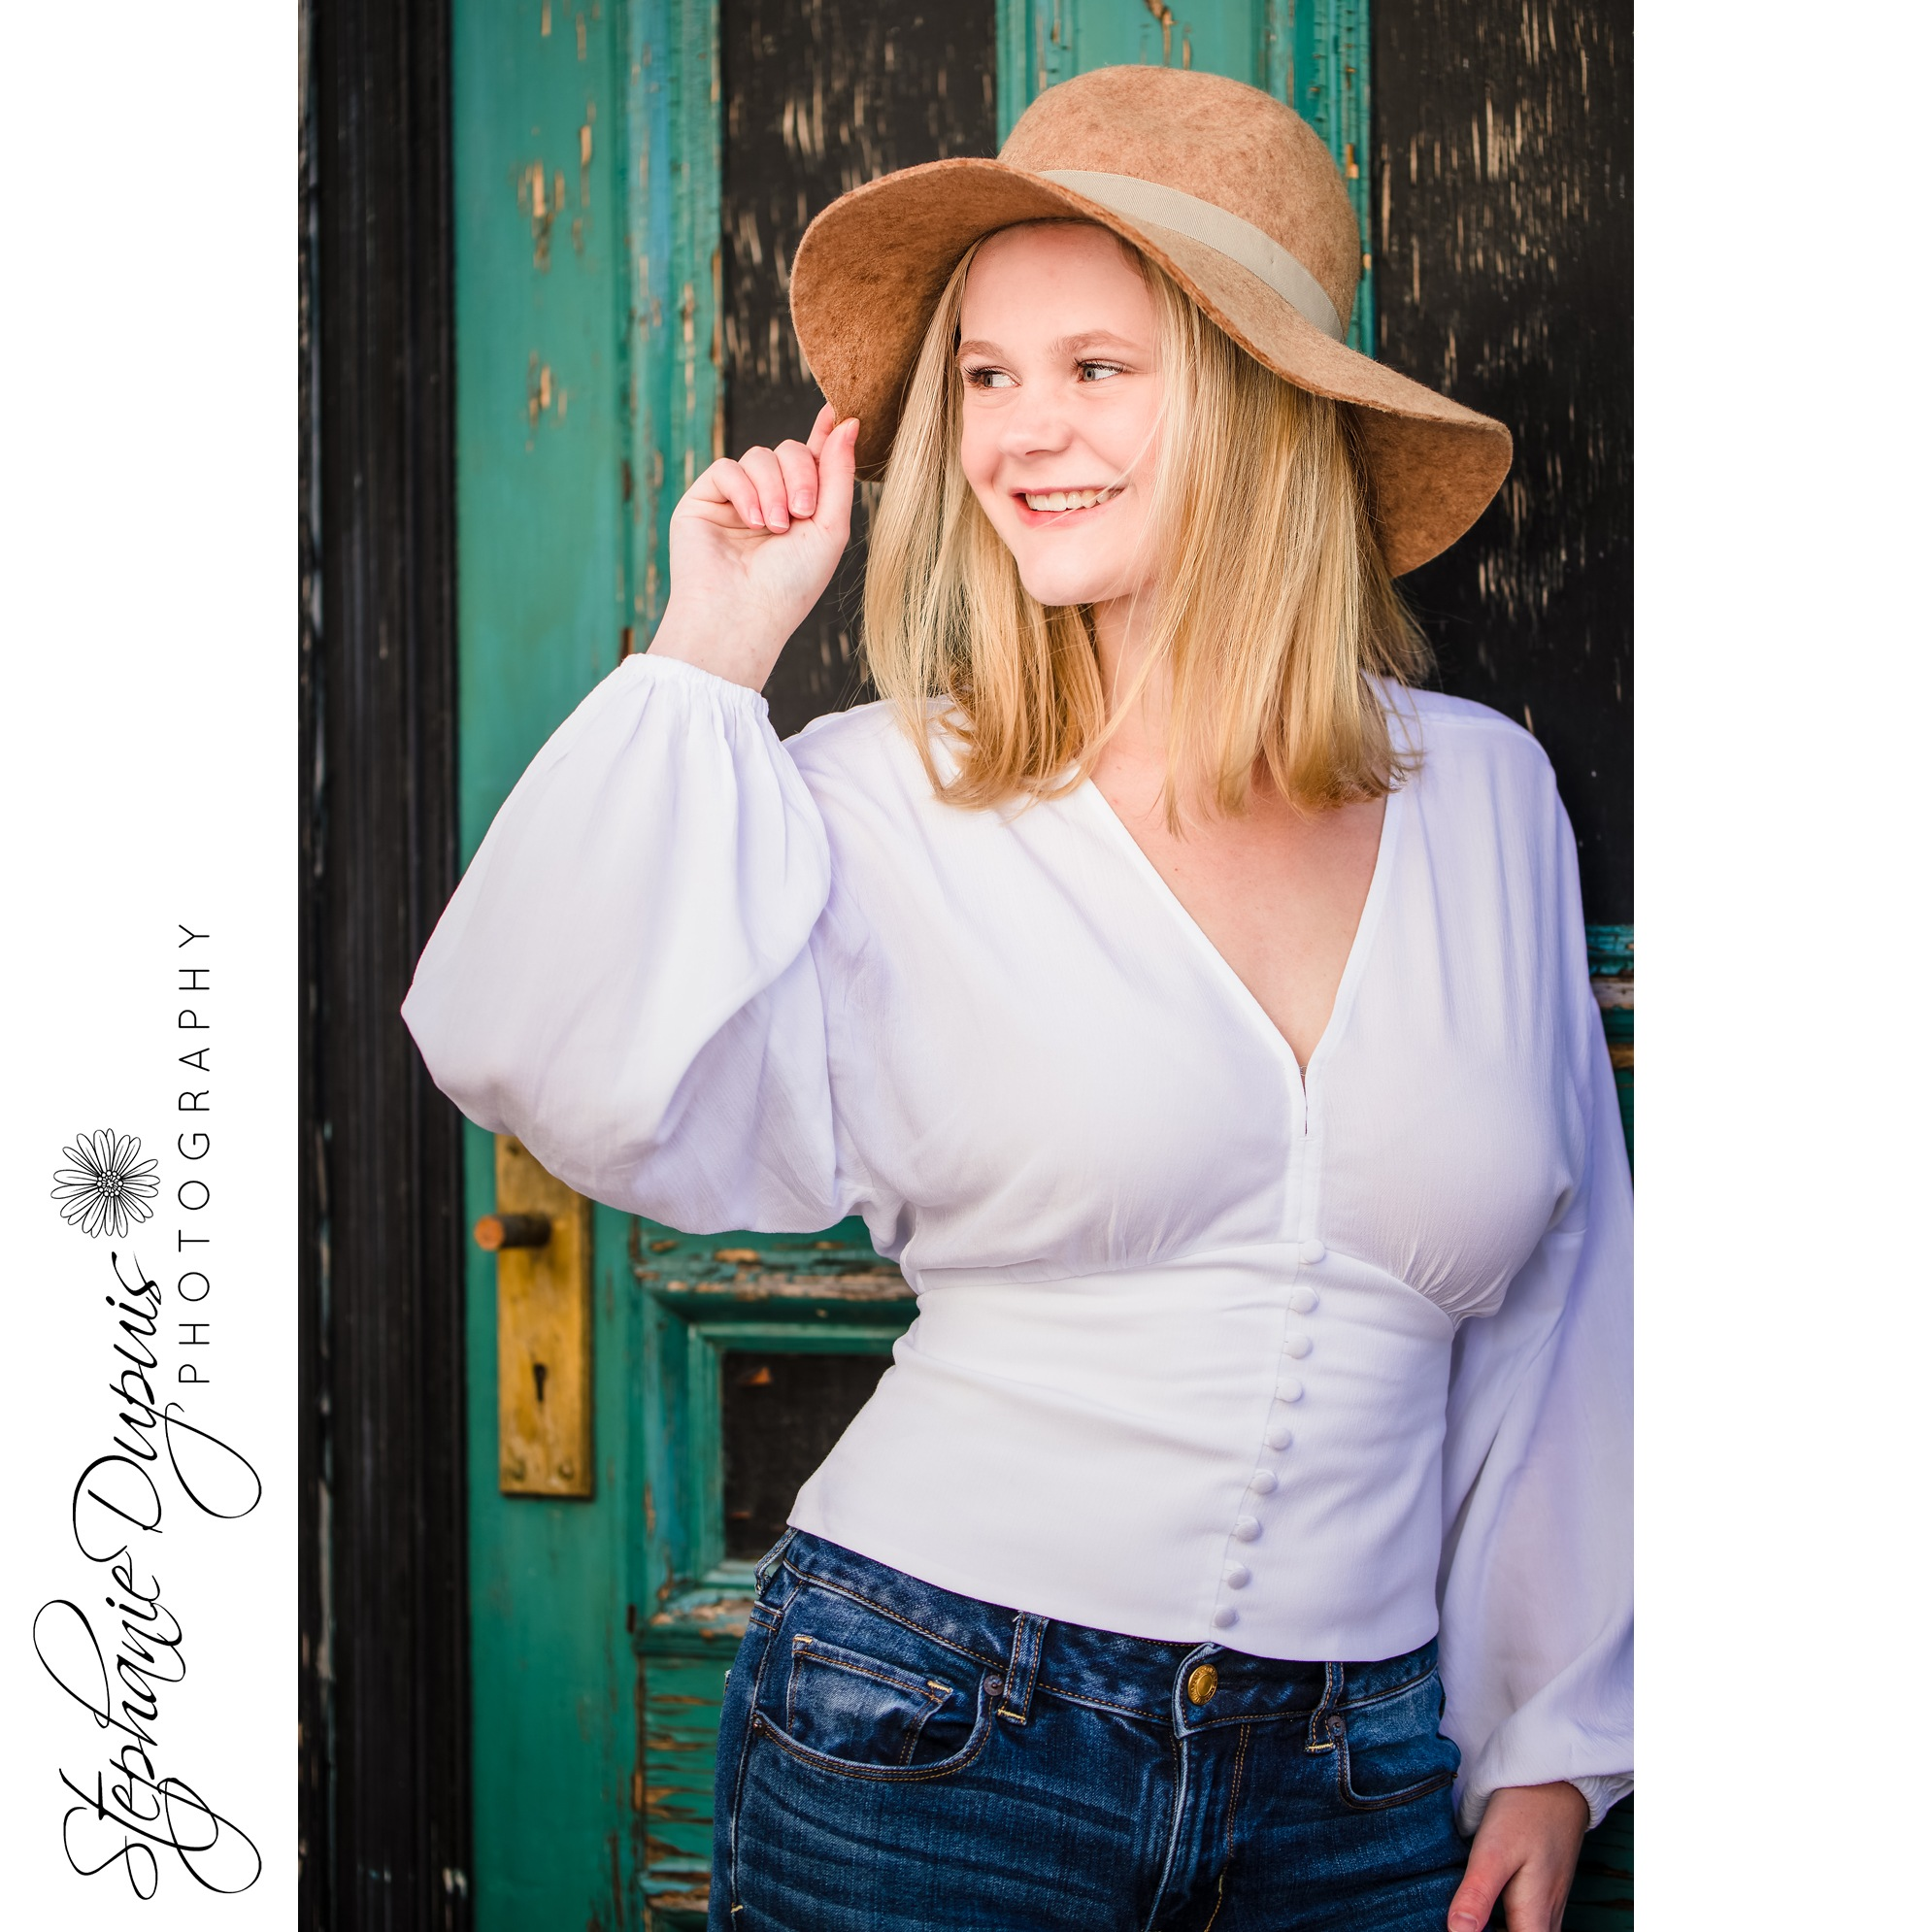 Riendeau 3 2 - Portfolio: Lisa HS Senior Session